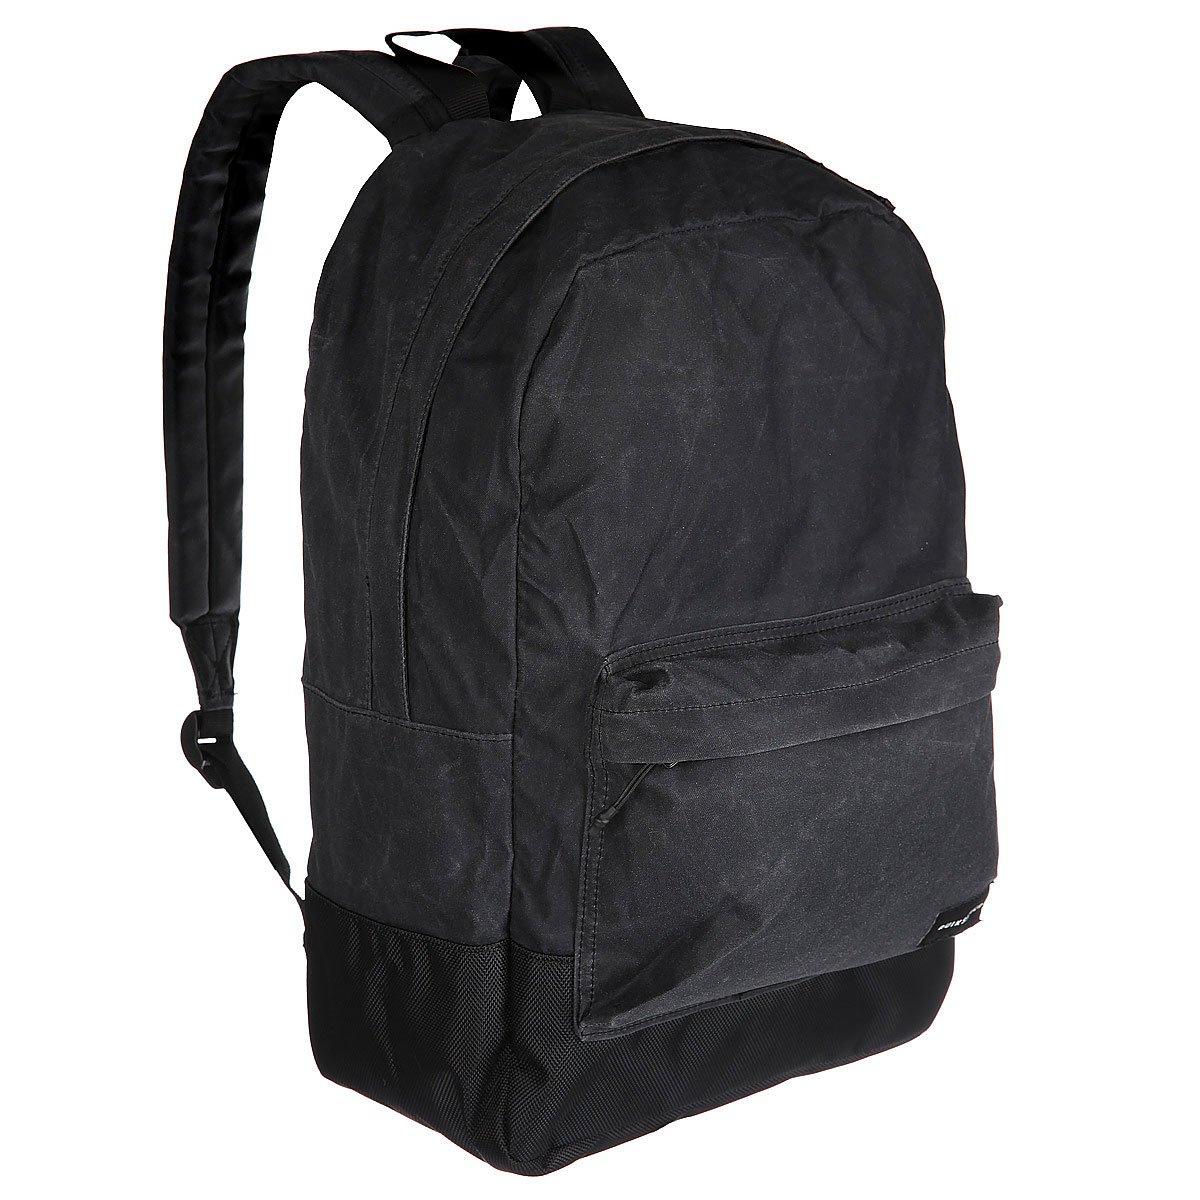 Quicksilver рюкзак night track среднее арифметическое портфеля и рюкзака